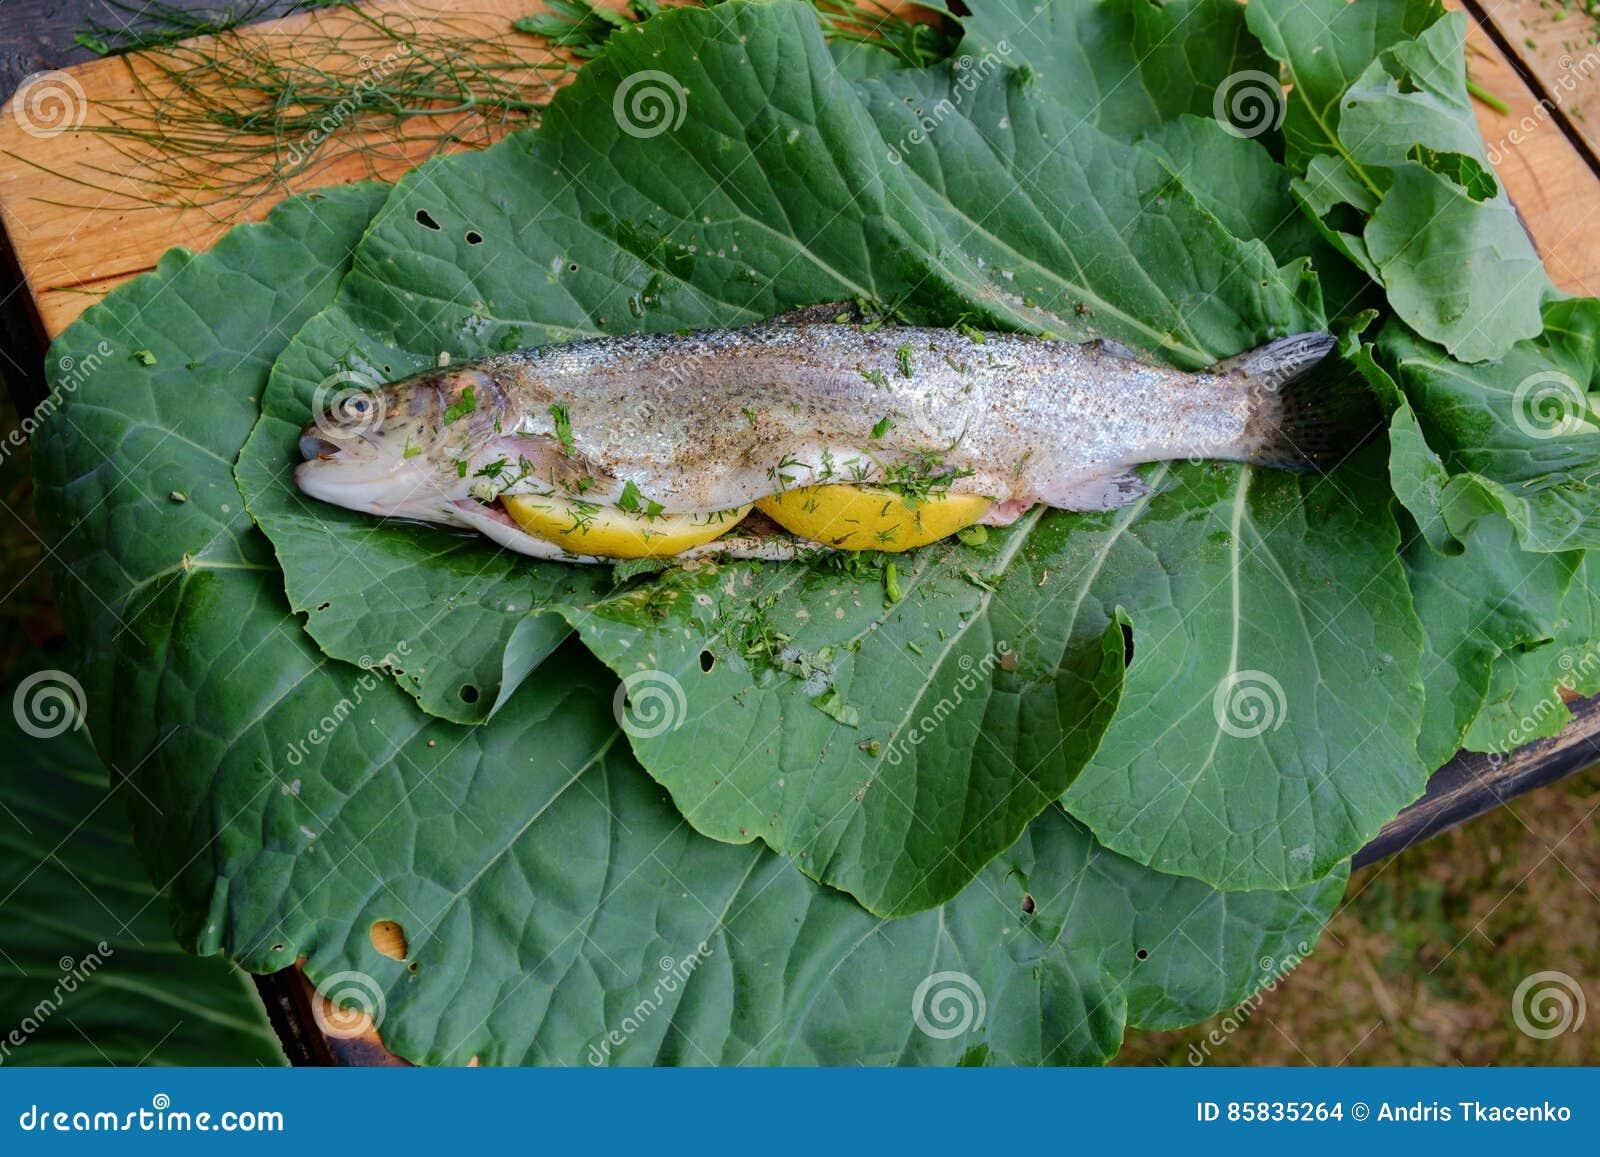 Prepared fresh trout